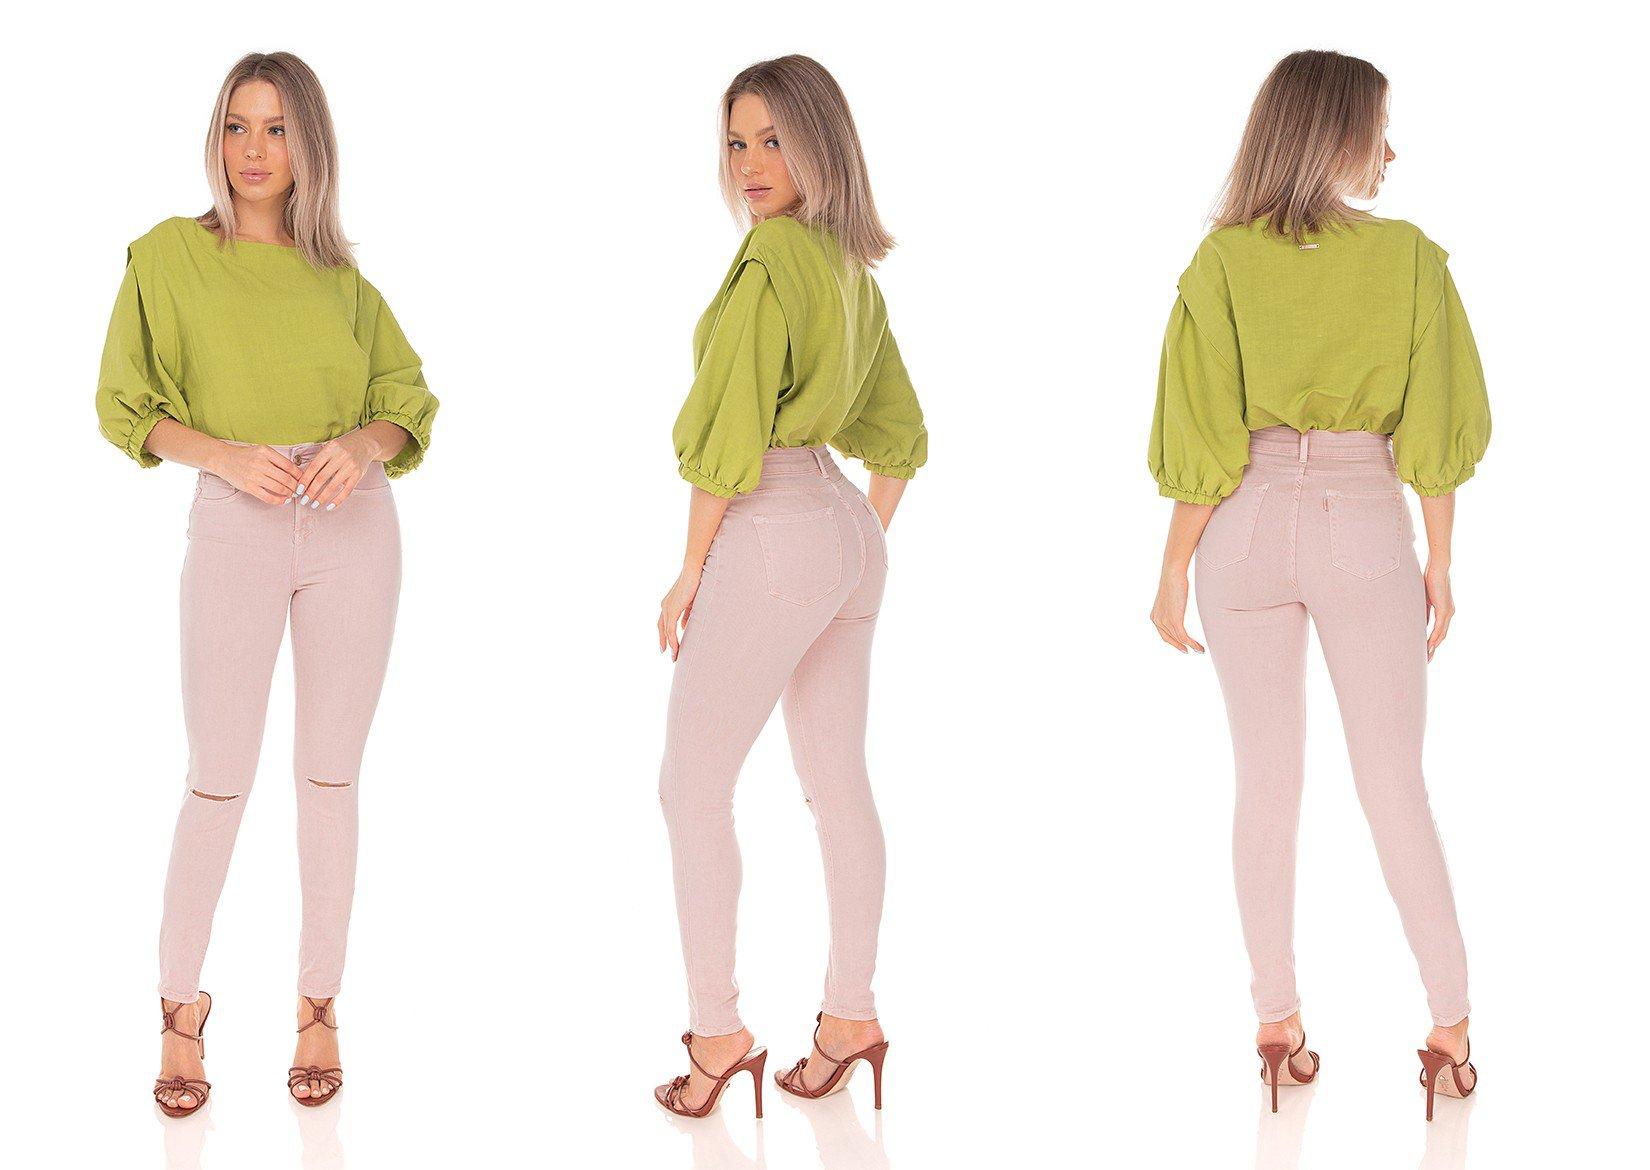 dz3624 calca jeans feminina skinny media rasgo no joelho colorida old roset denim zero tripla